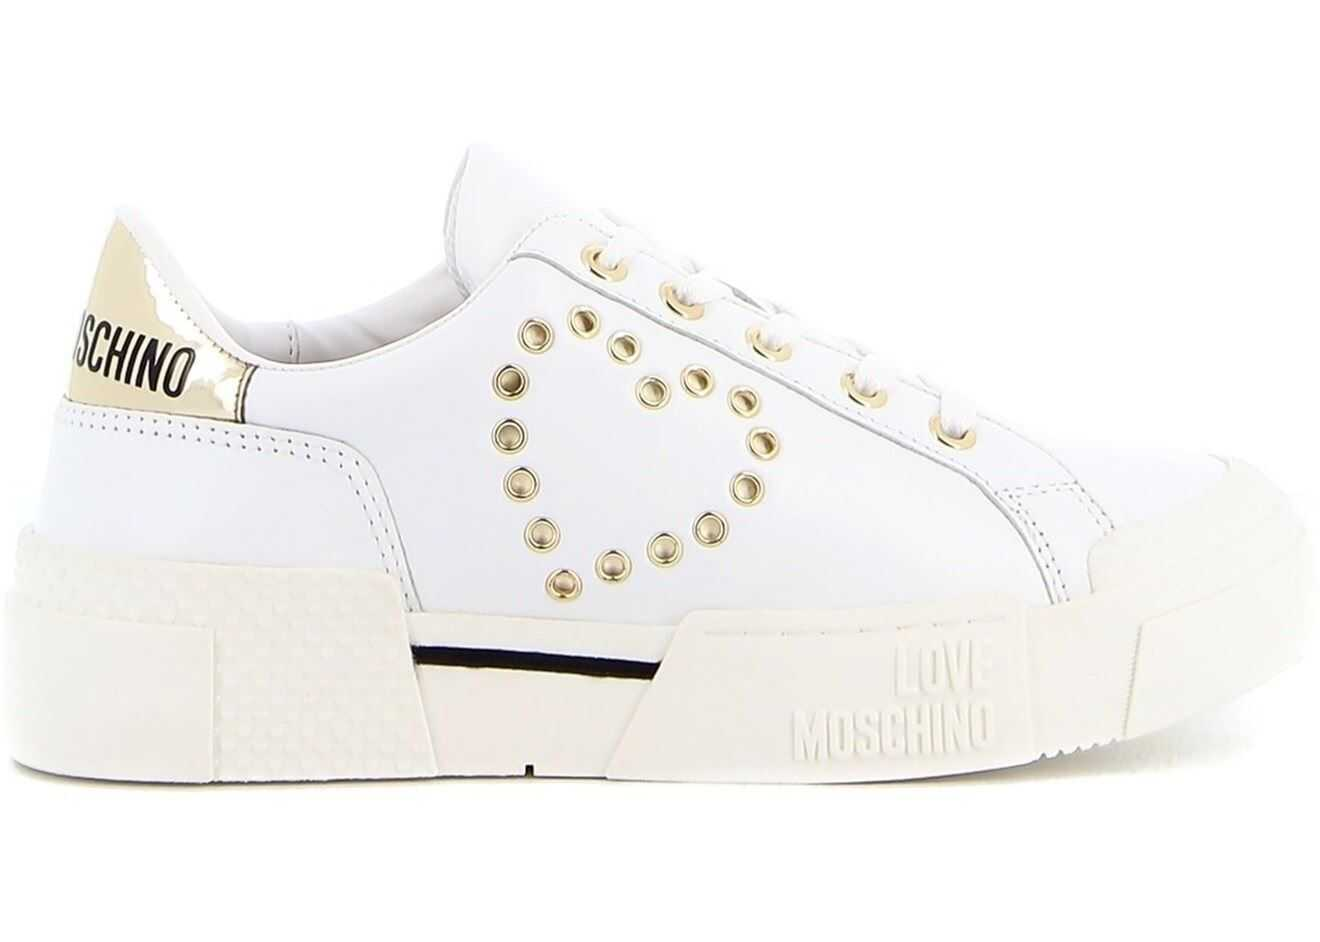 LOVE Moschino Eyelet Detailed Sneakers In White JA15425G0CJAS100 White imagine b-mall.ro